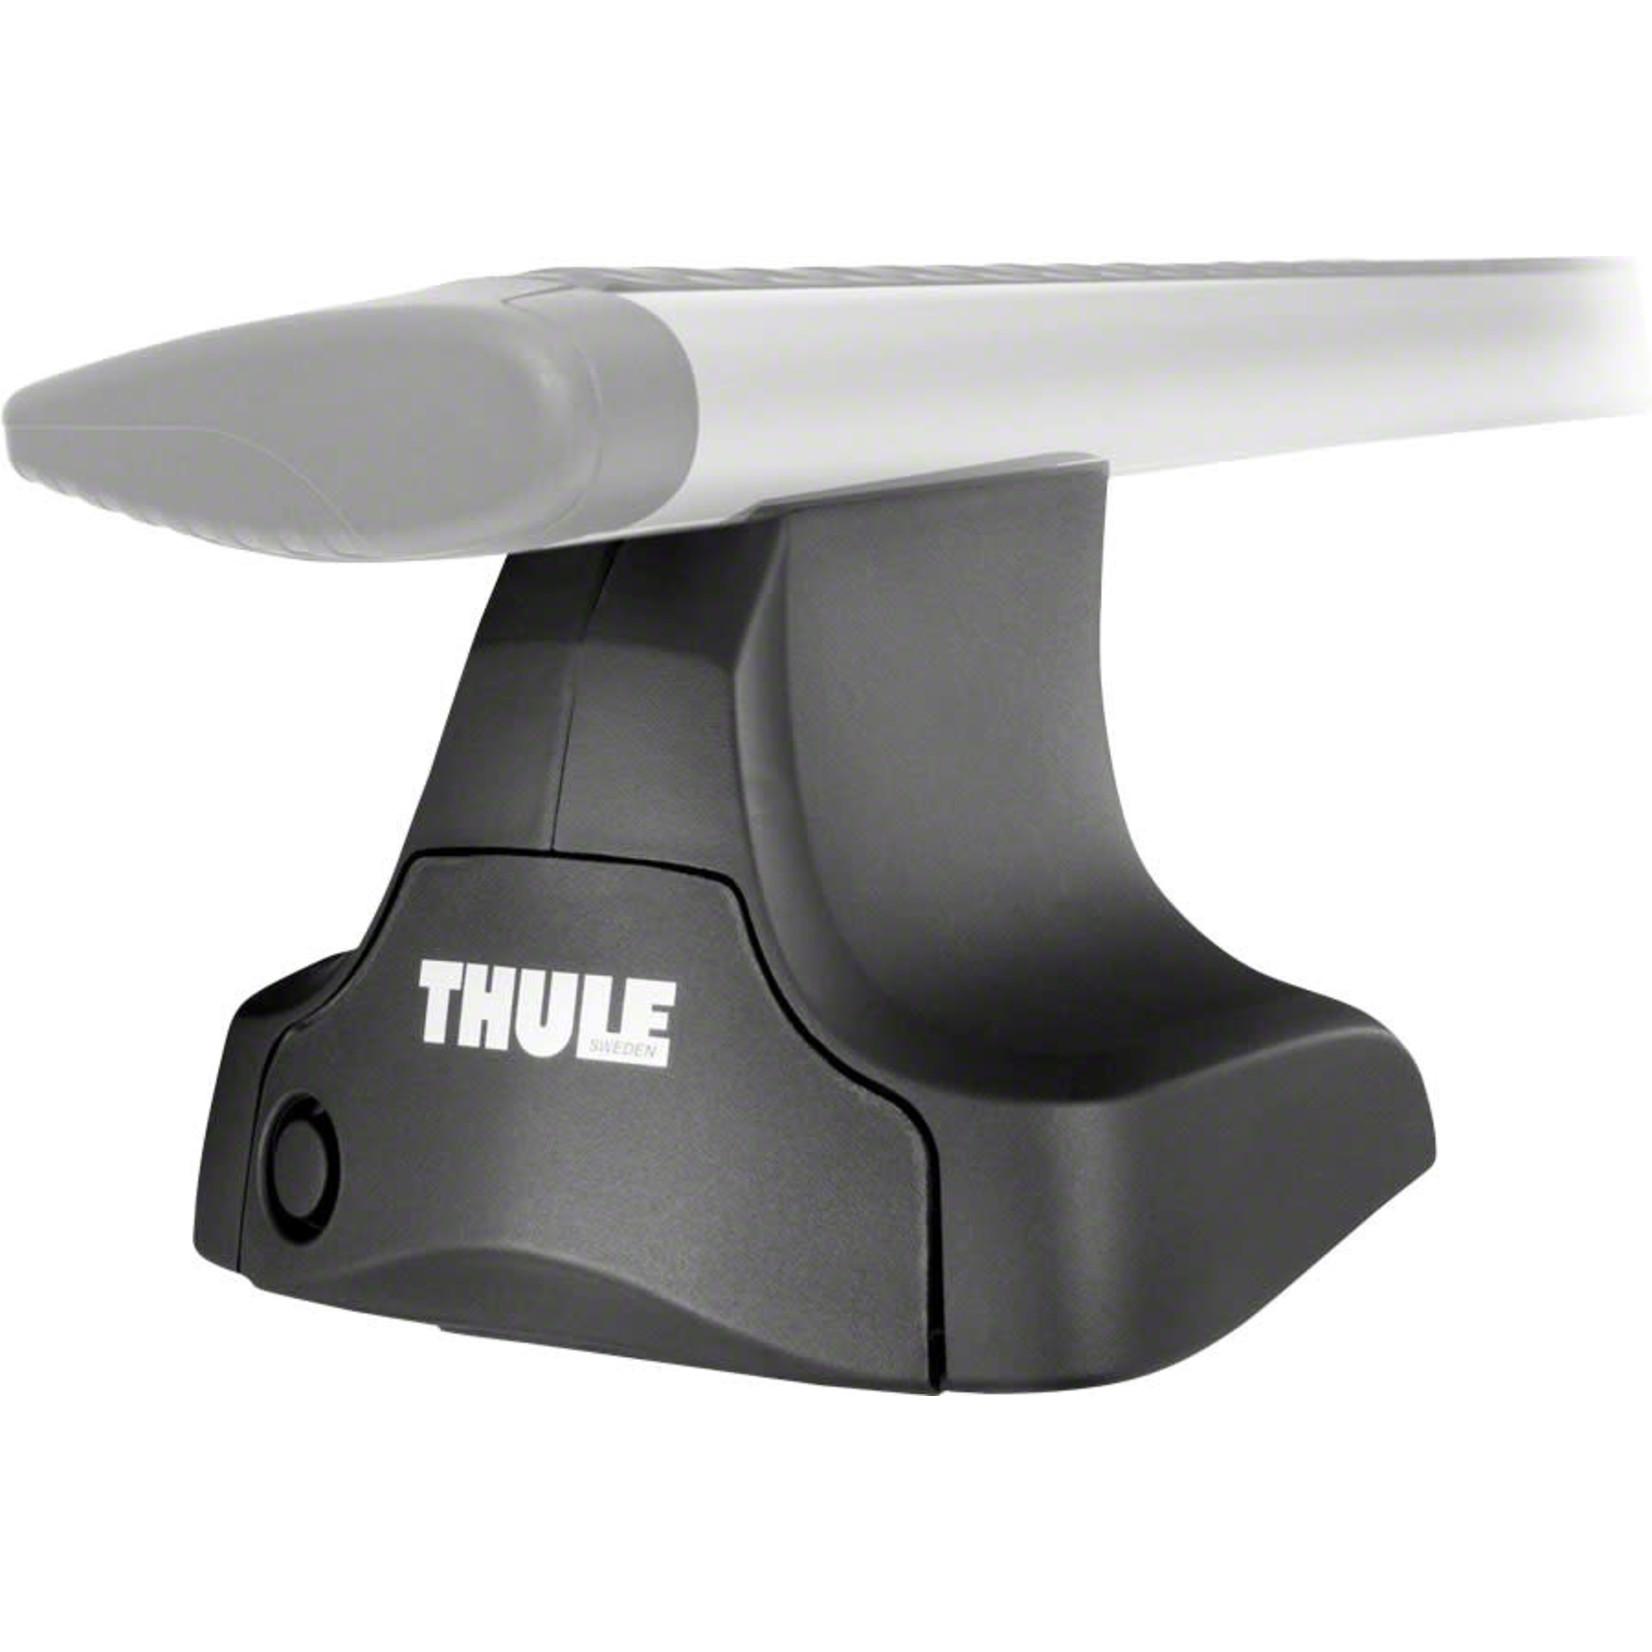 Thule Thule 480R Rapid Traverse Foot Pack Load Bar Tower Set: Fits Rapid Aero Bars; 4-Pack